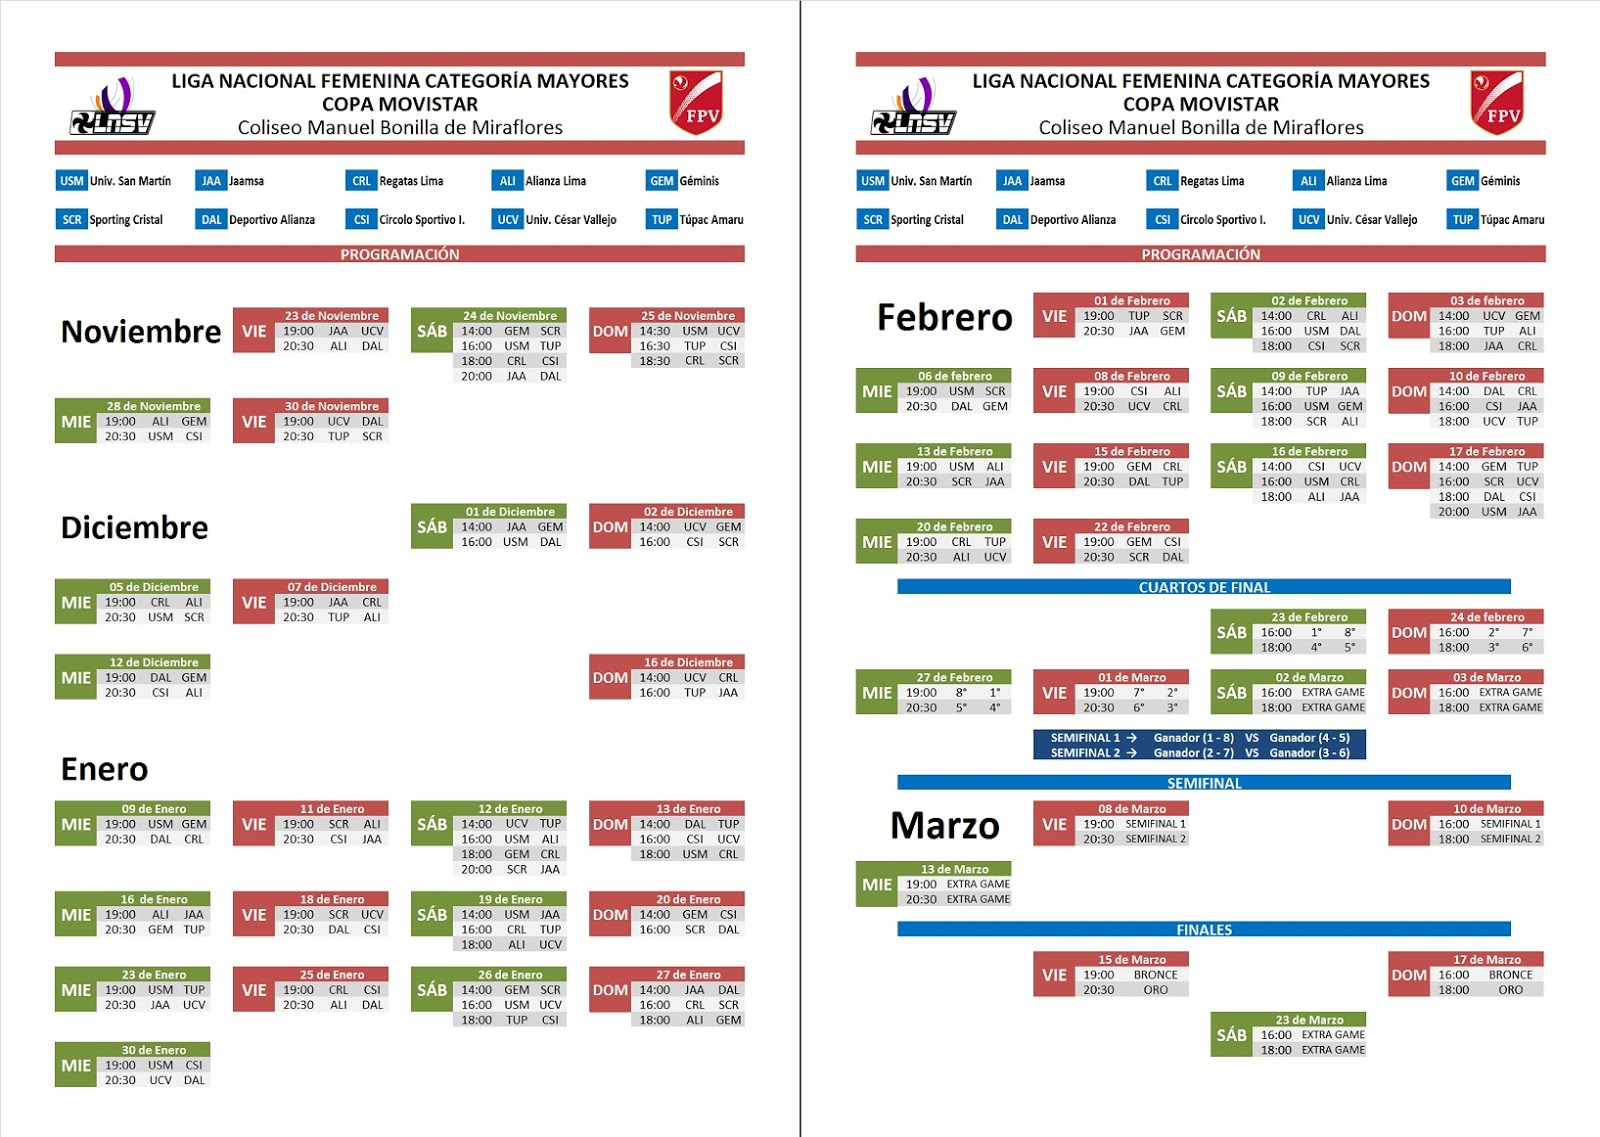 Calendario LNSV Femenino Mayores